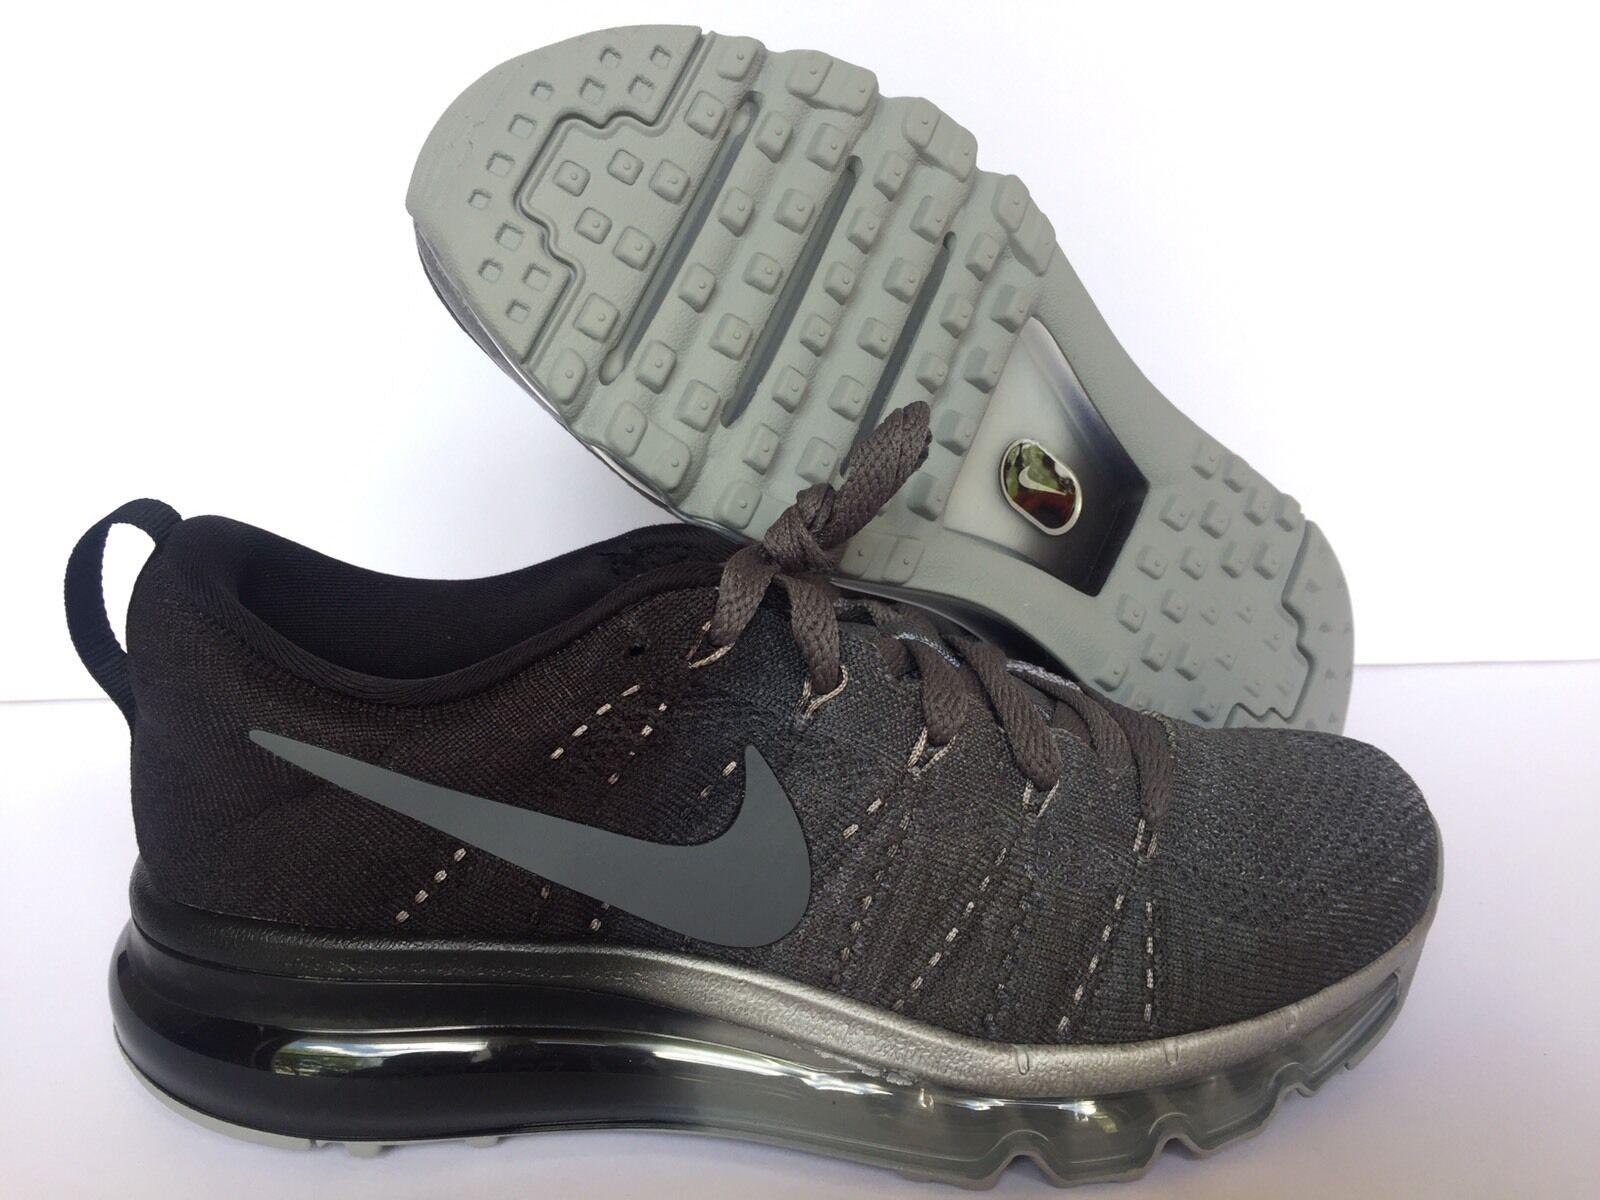 Nike Air Max Authentic Women's Running Shoe [874793-992] US WOMEN SZ 5.5